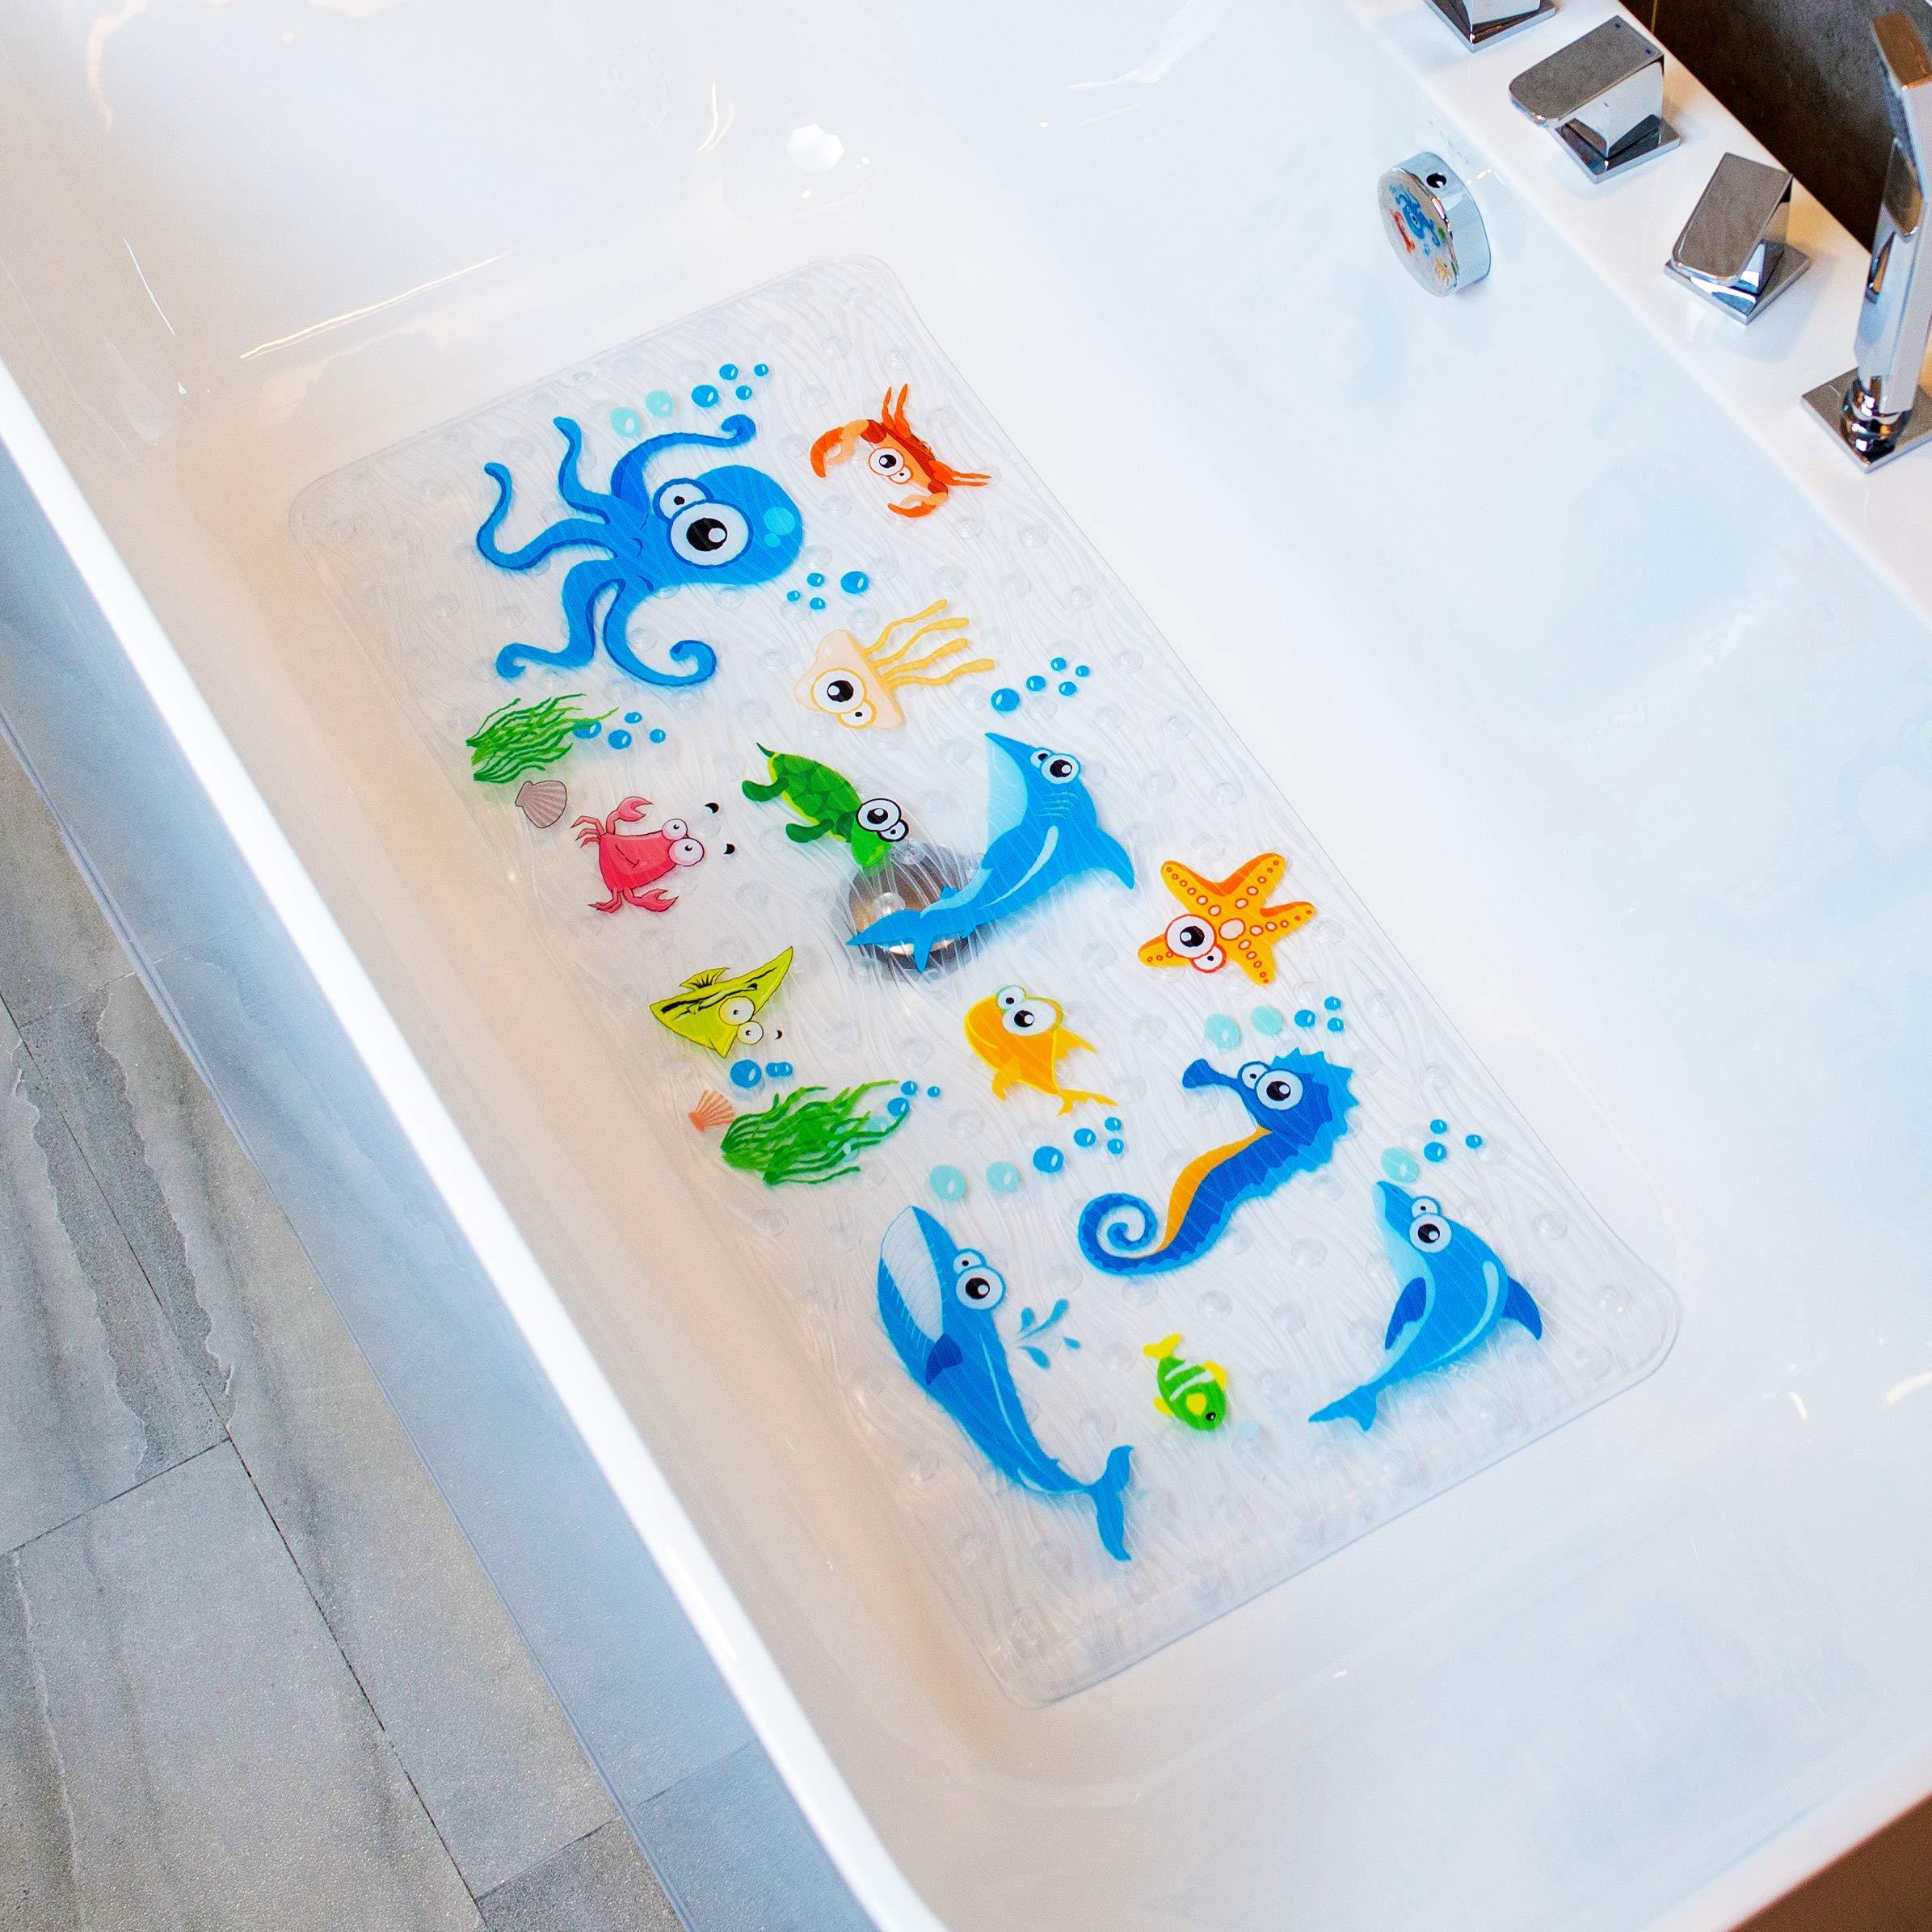 BeeHomee Bath Mats Tub Kids